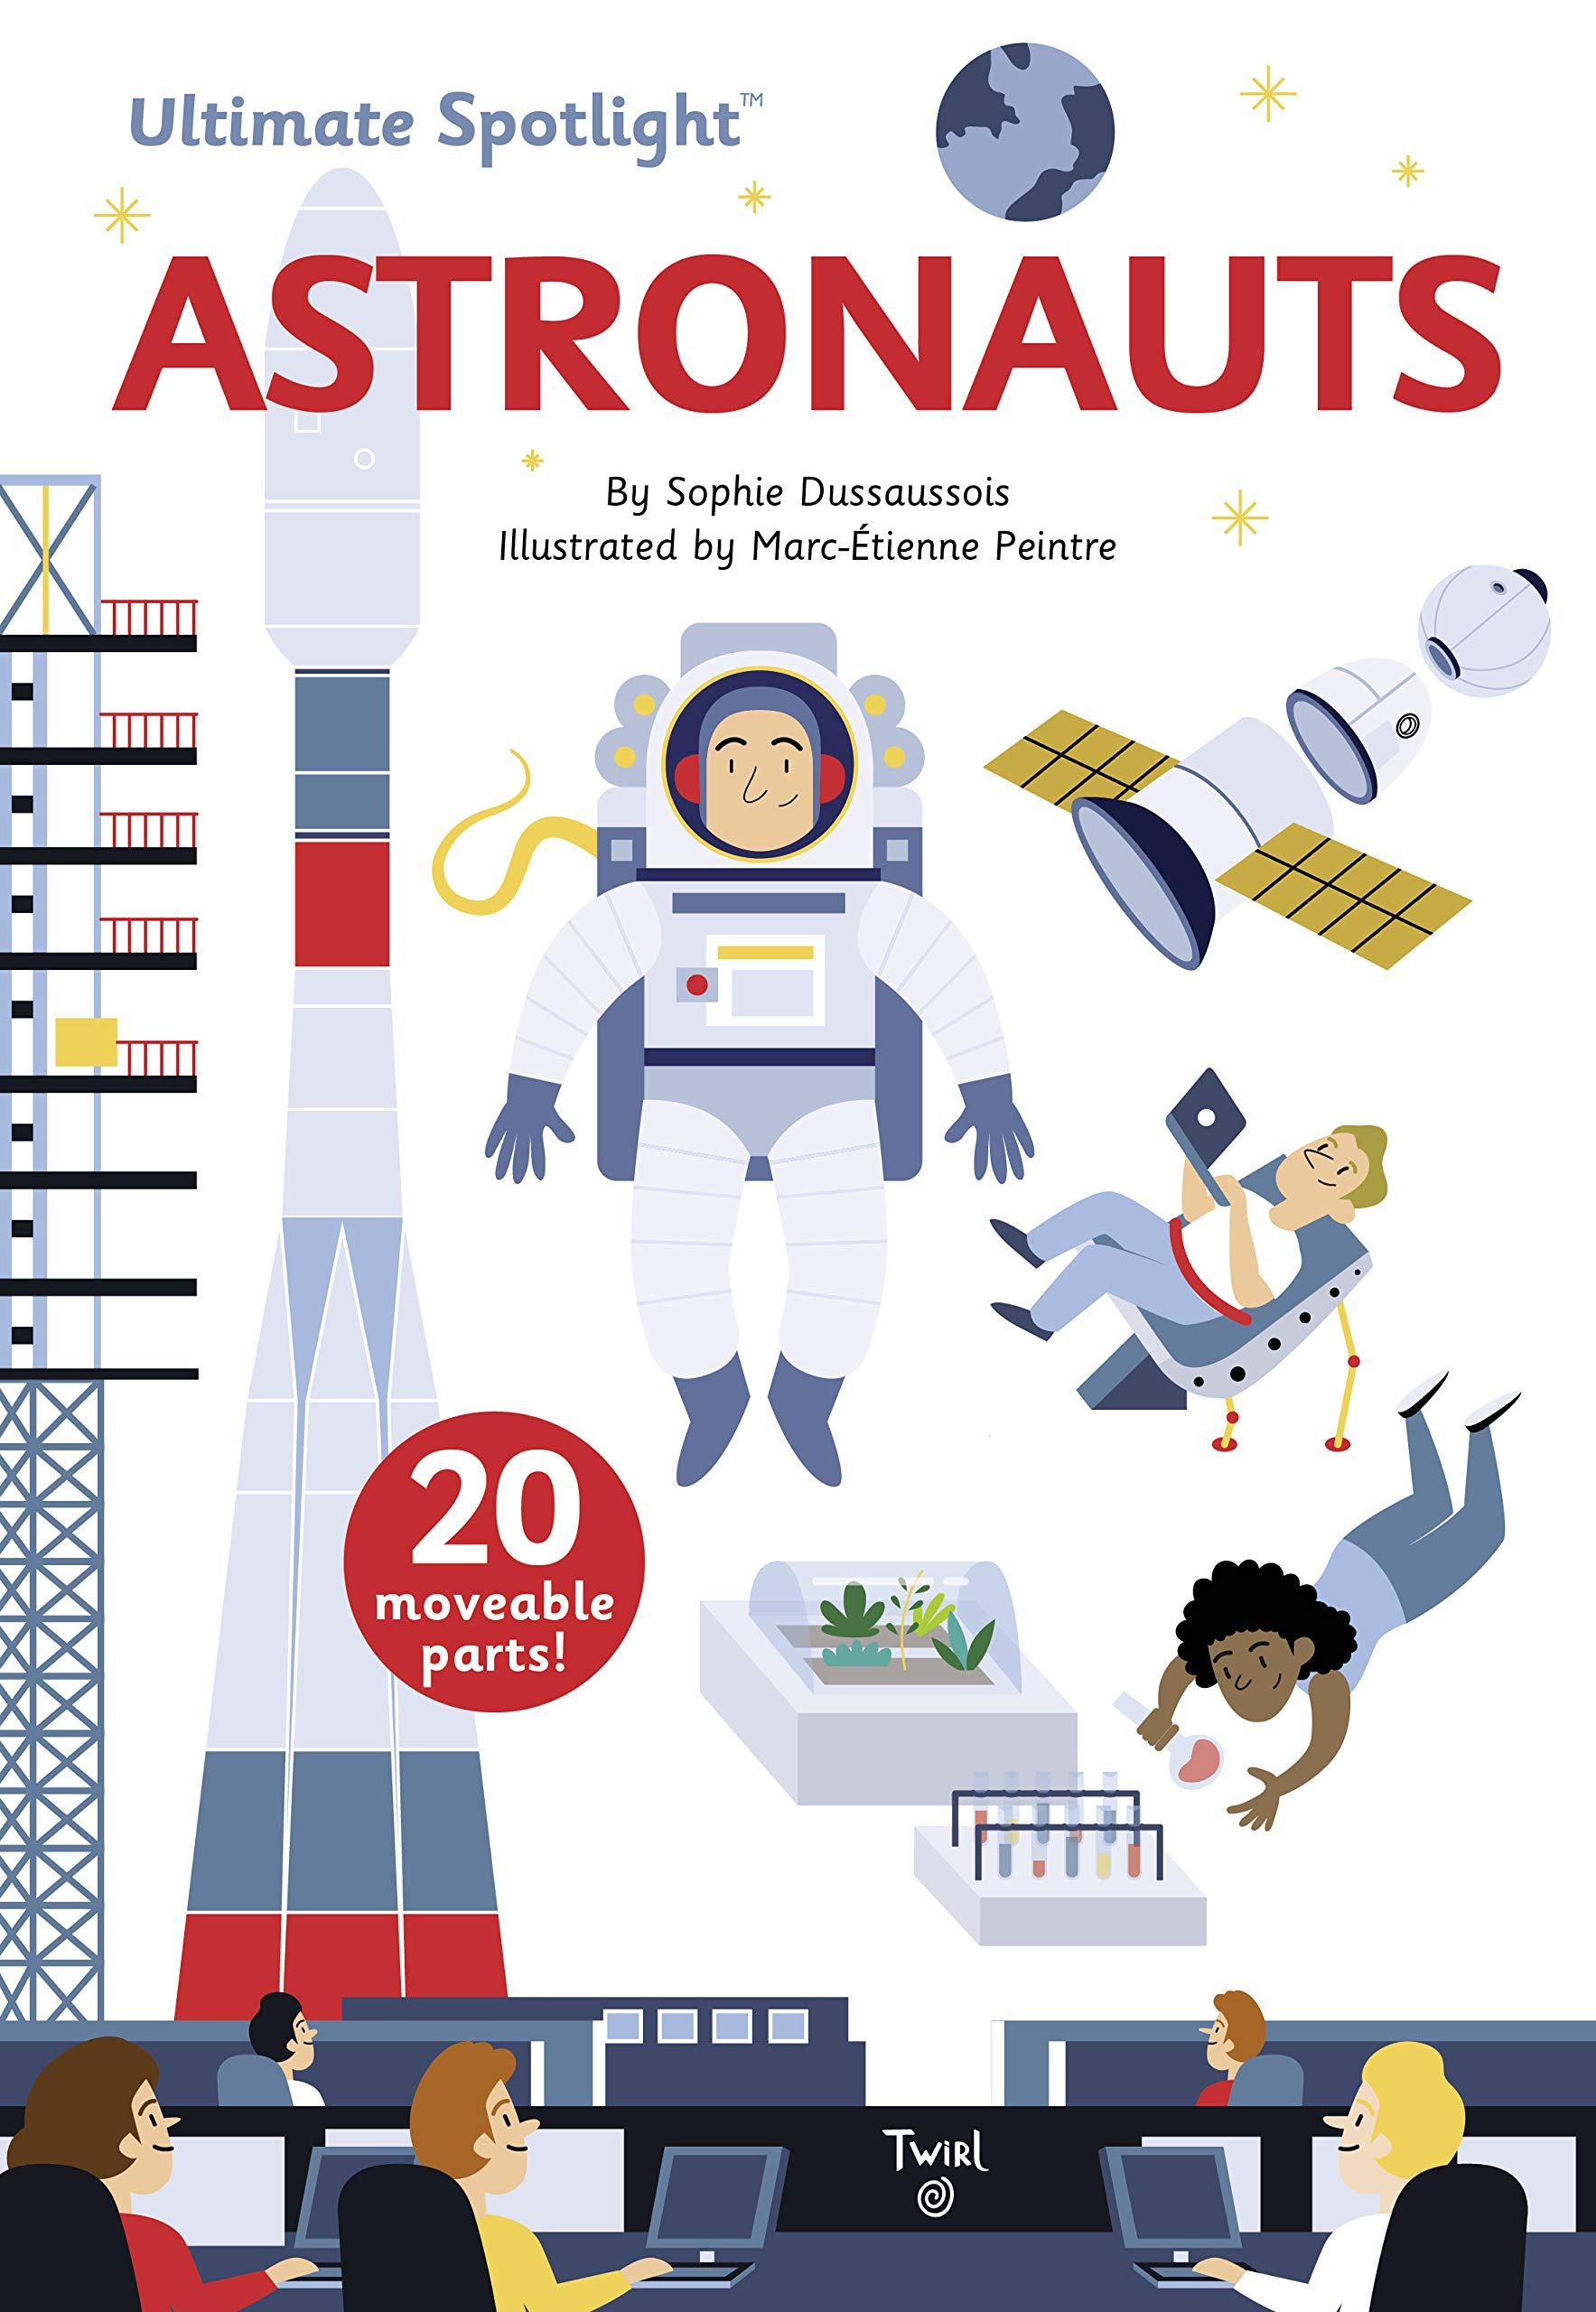 Ultimate Spotlight: Astronauts (Hardcover)